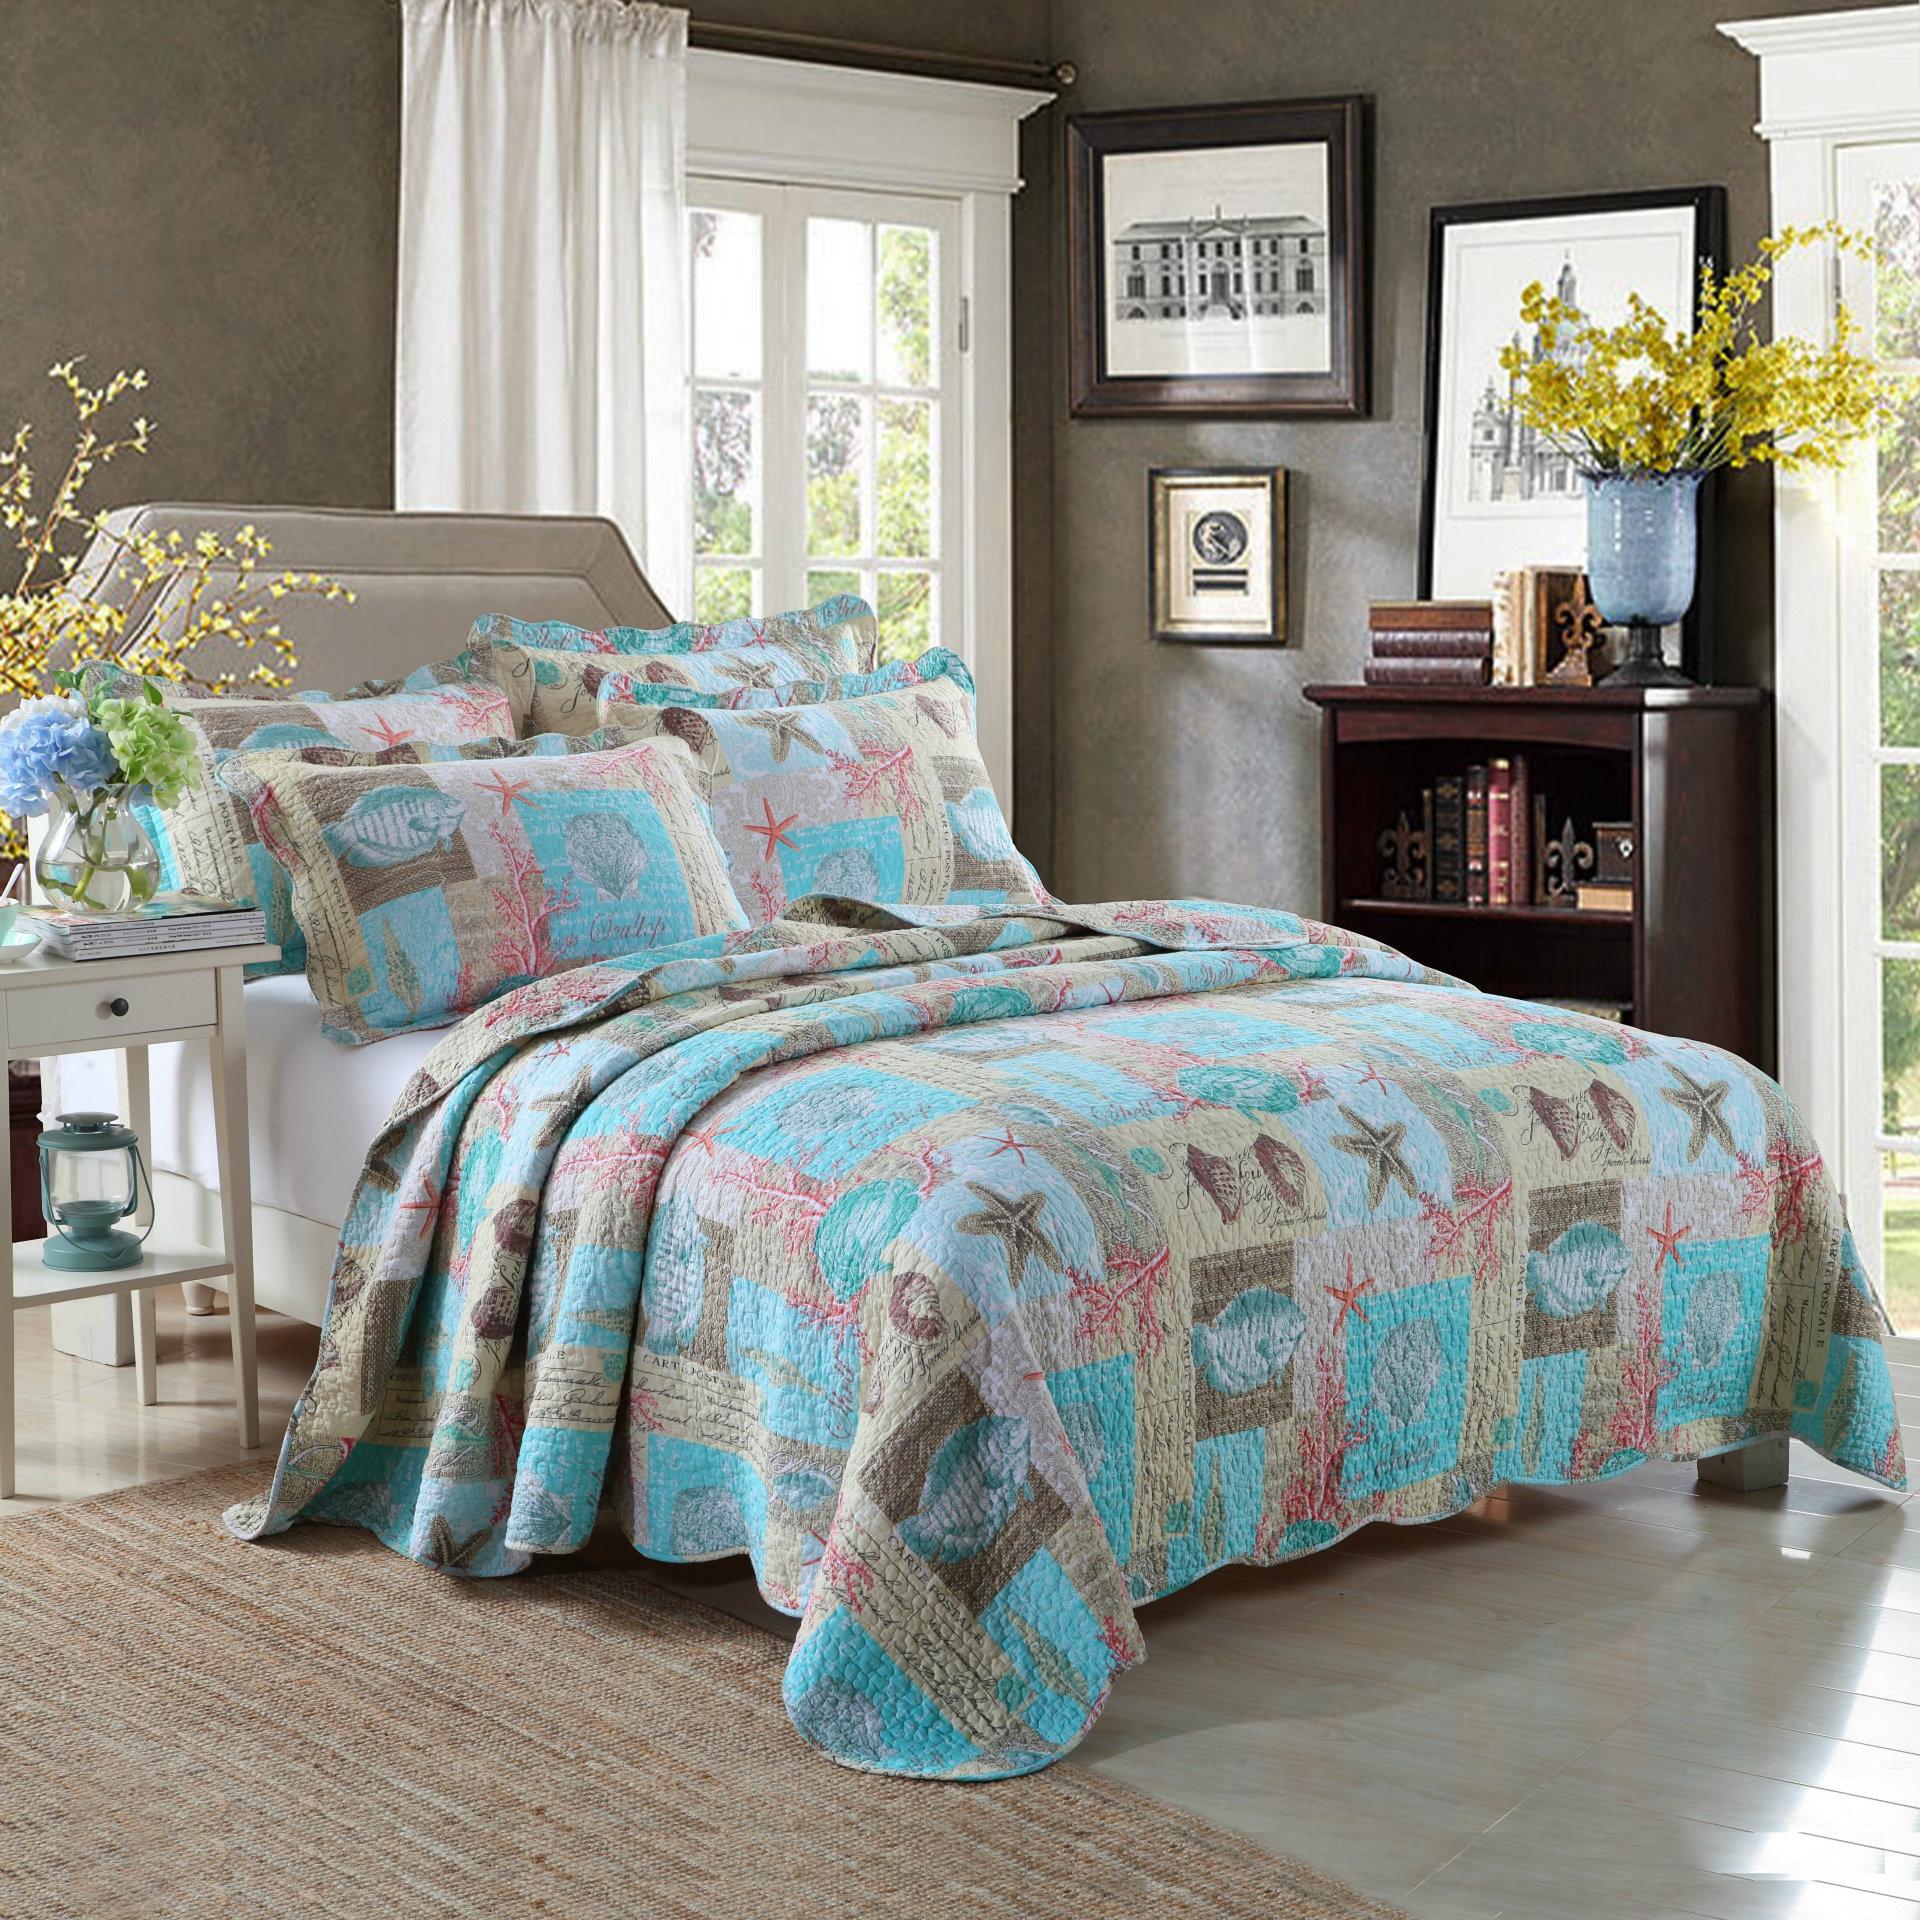 Ultra Soft Coral Ocean Bedspread Quilt Set Turtle Fish Seashells Beach Theme Print Quilt Set Comforter